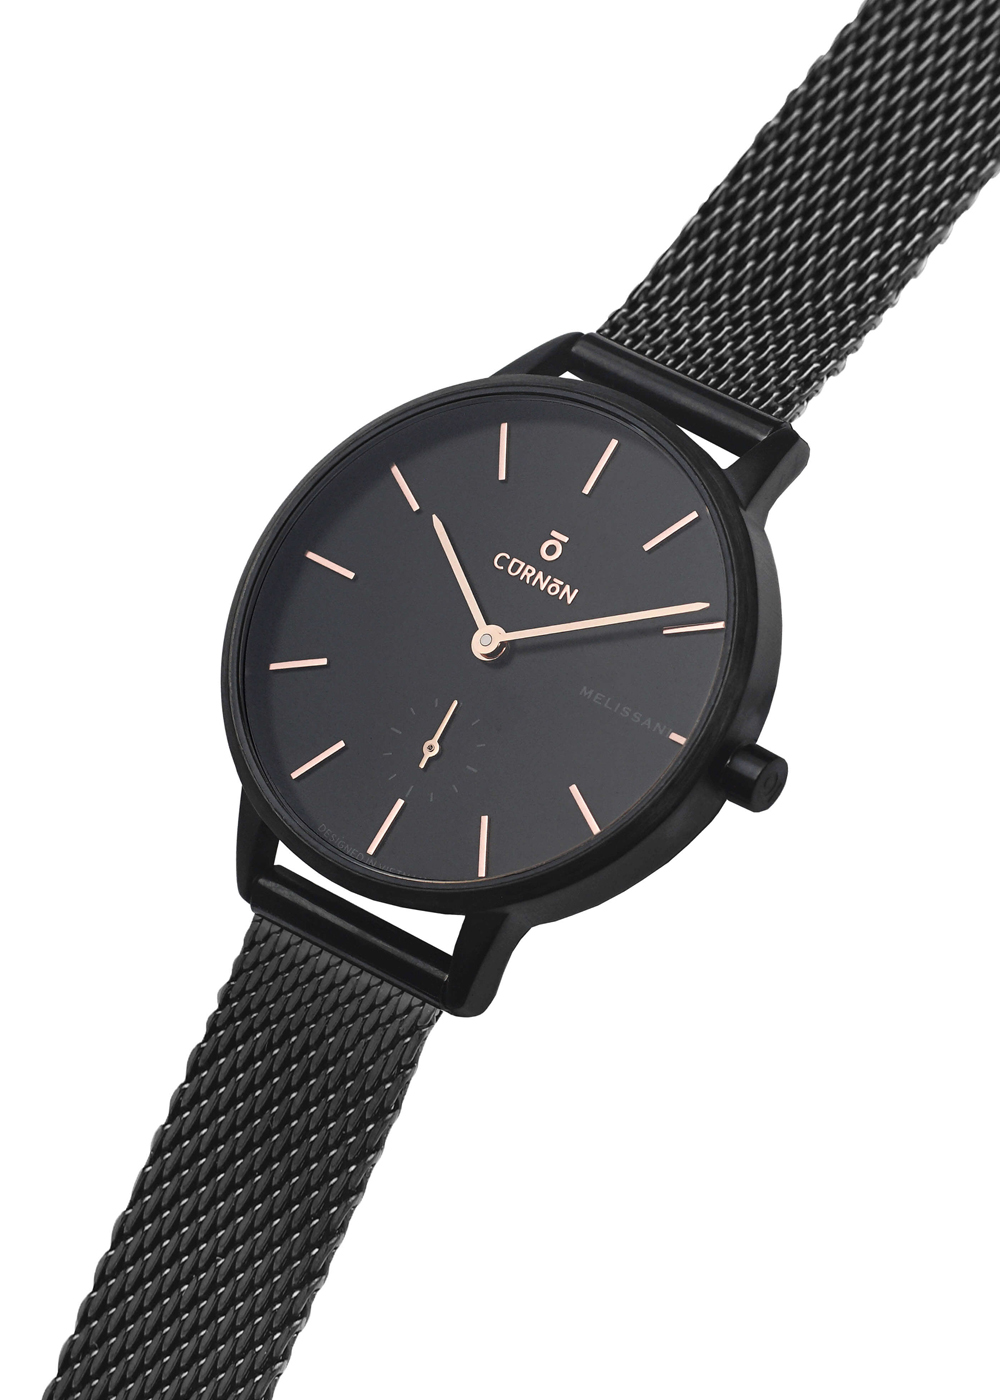 Đồng hồ nữ Dây Kim Loại Curnon Melissani Gale Kính Sapphire (32mm)